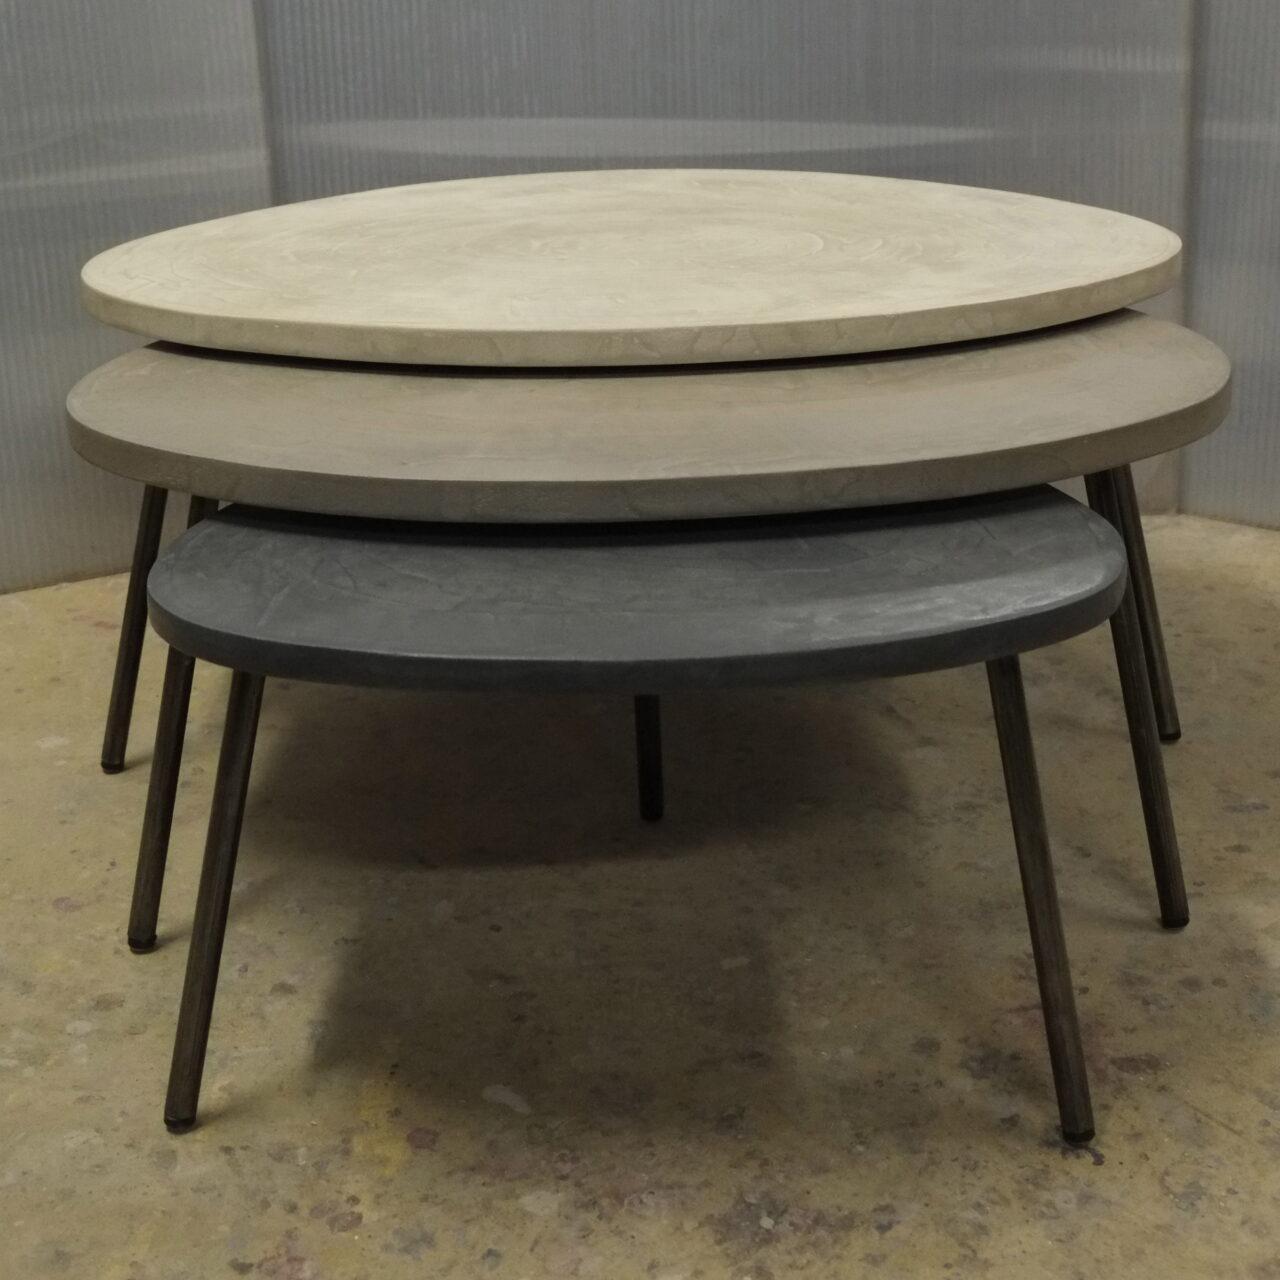 tables basses en b ton sur mesure rugiada meubles industriel anna colore industriale. Black Bedroom Furniture Sets. Home Design Ideas